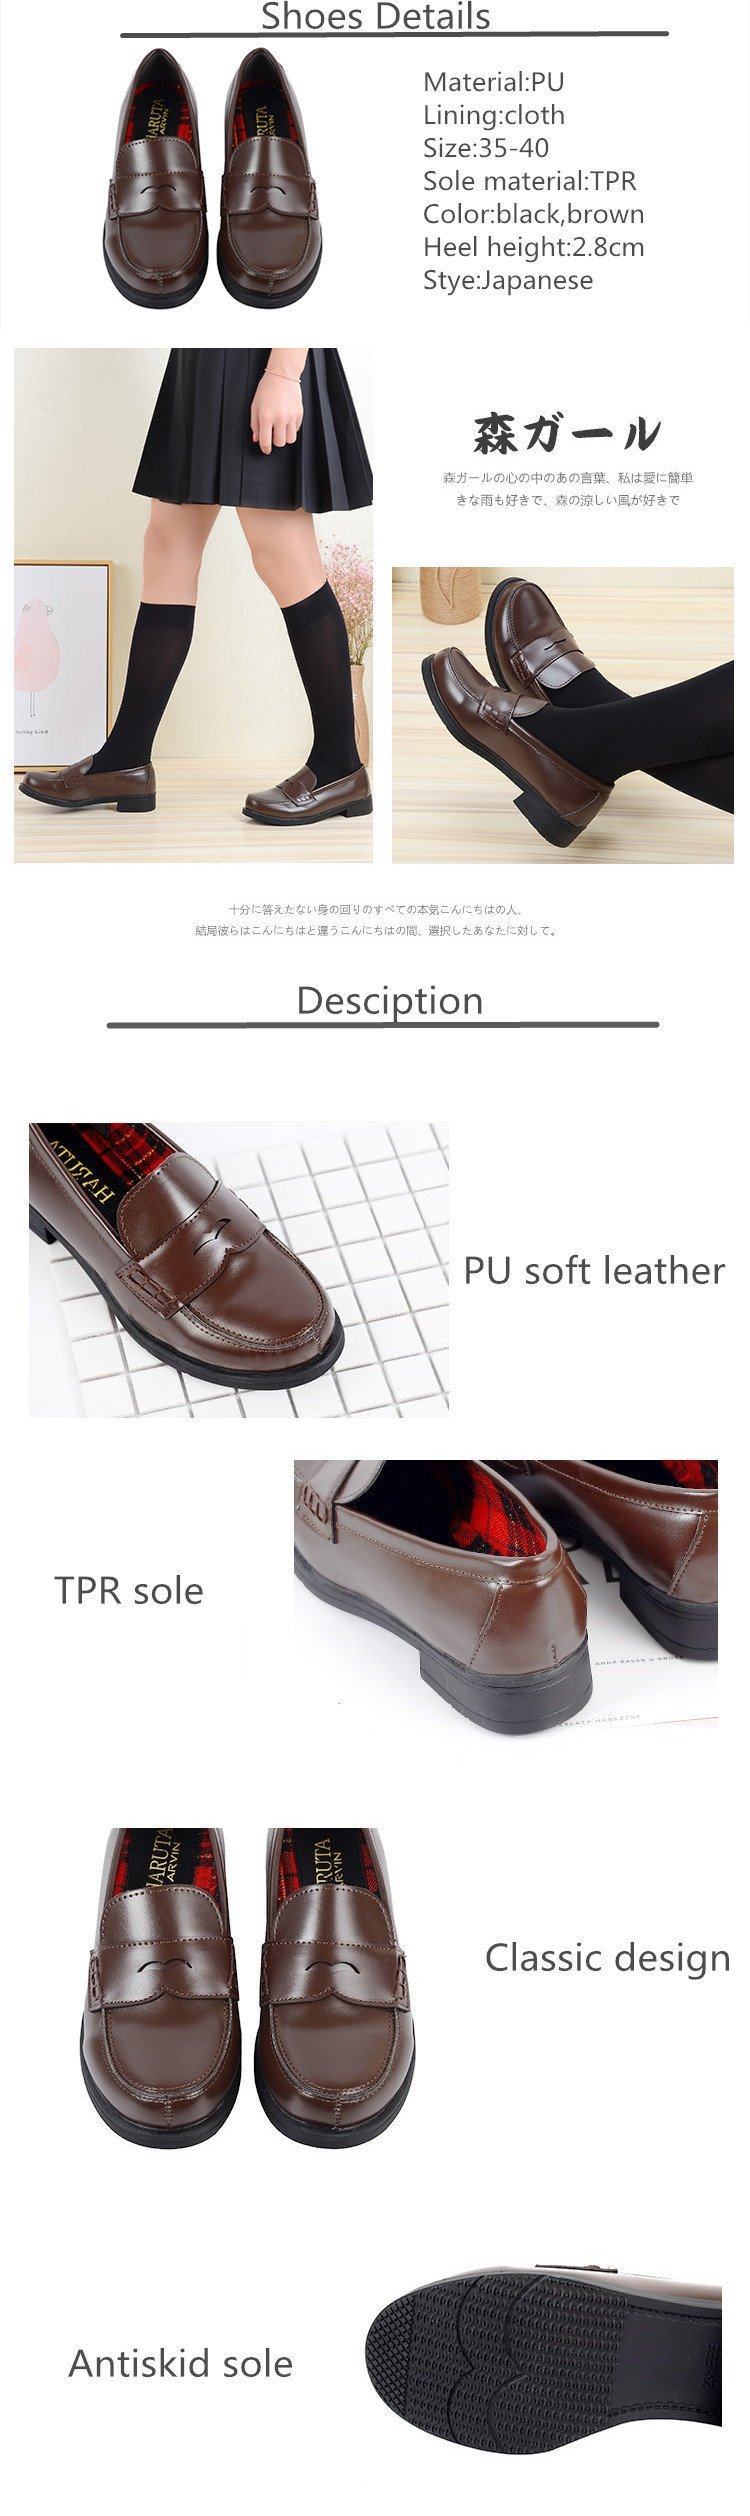 Japanese School Uniform Low Flat Heel Student Shoes Leather Maid Lolita Cosplay